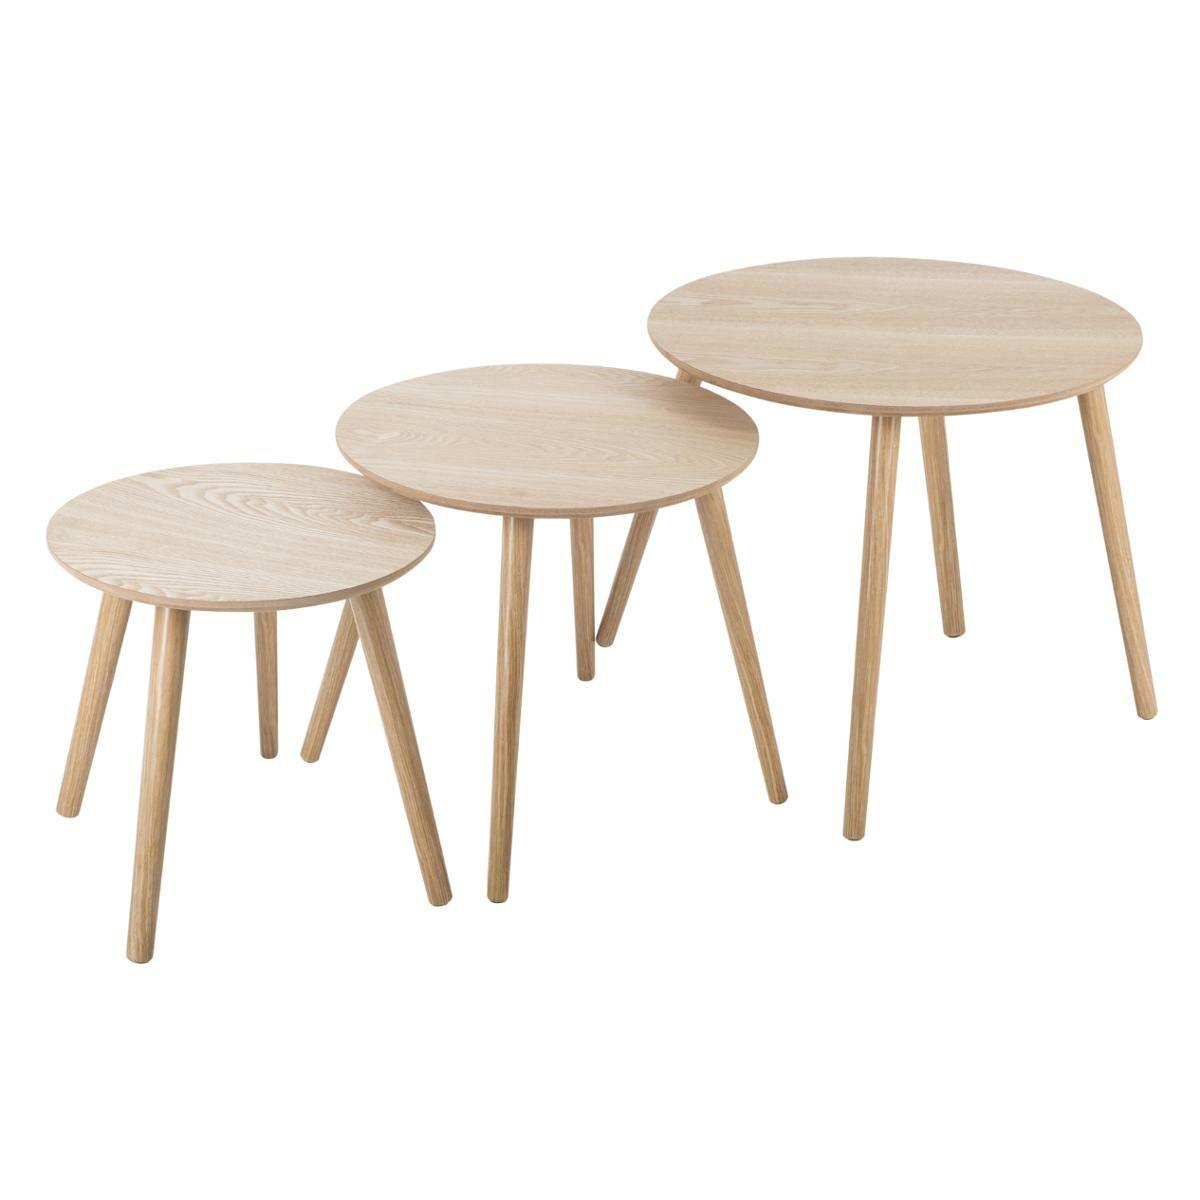 Norden Home Ingram 3 Piece Nest Of Tables Wayfair Co Uk